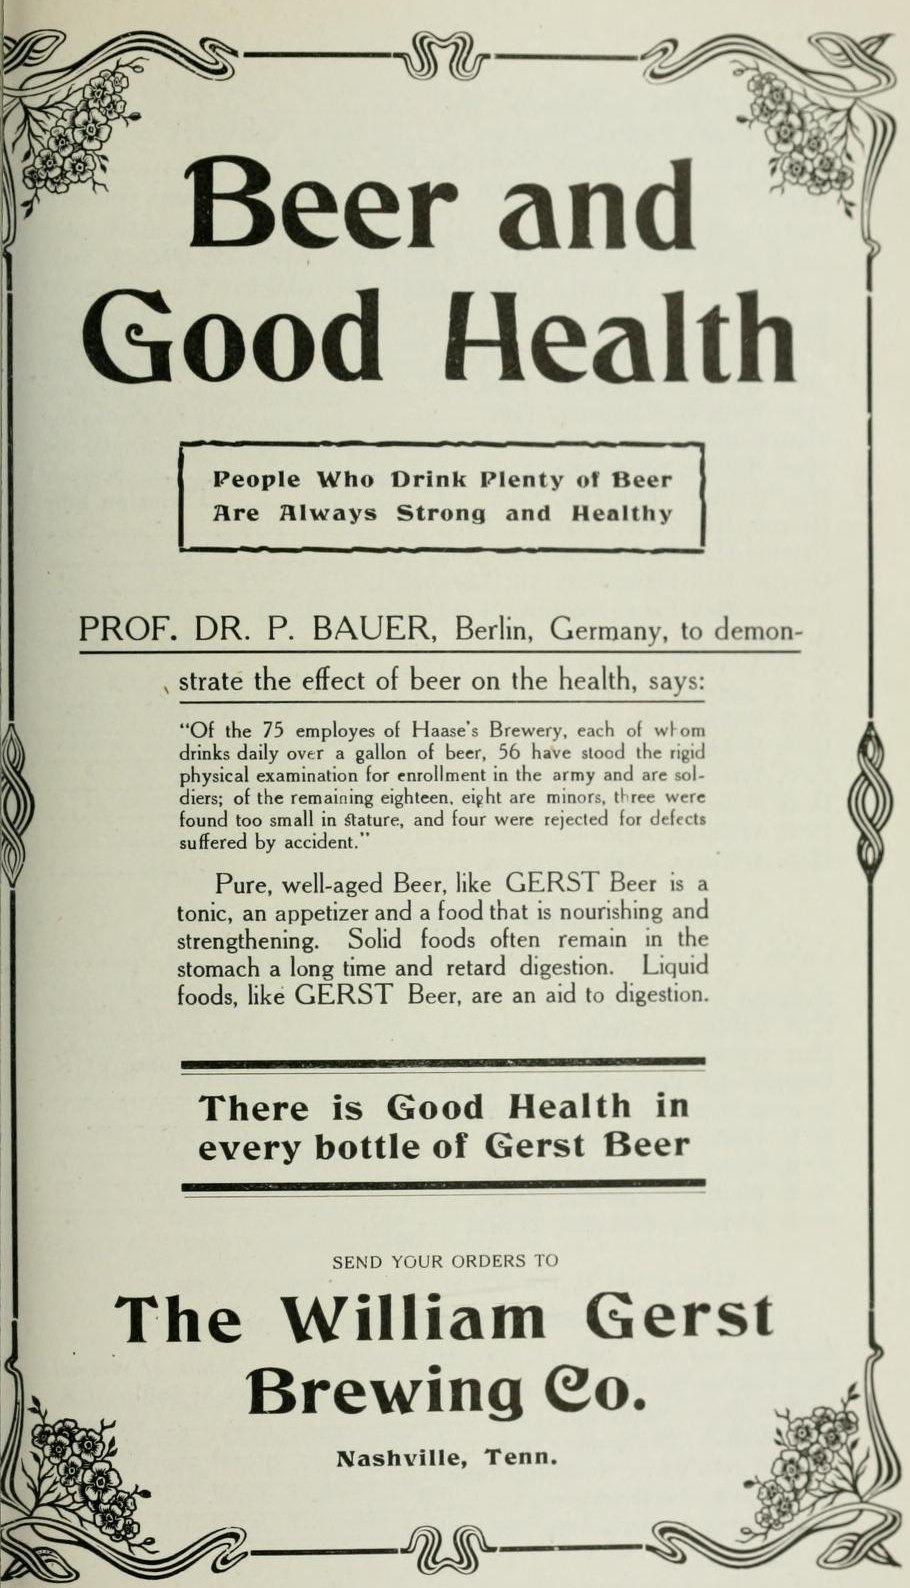 Good-Health-1907